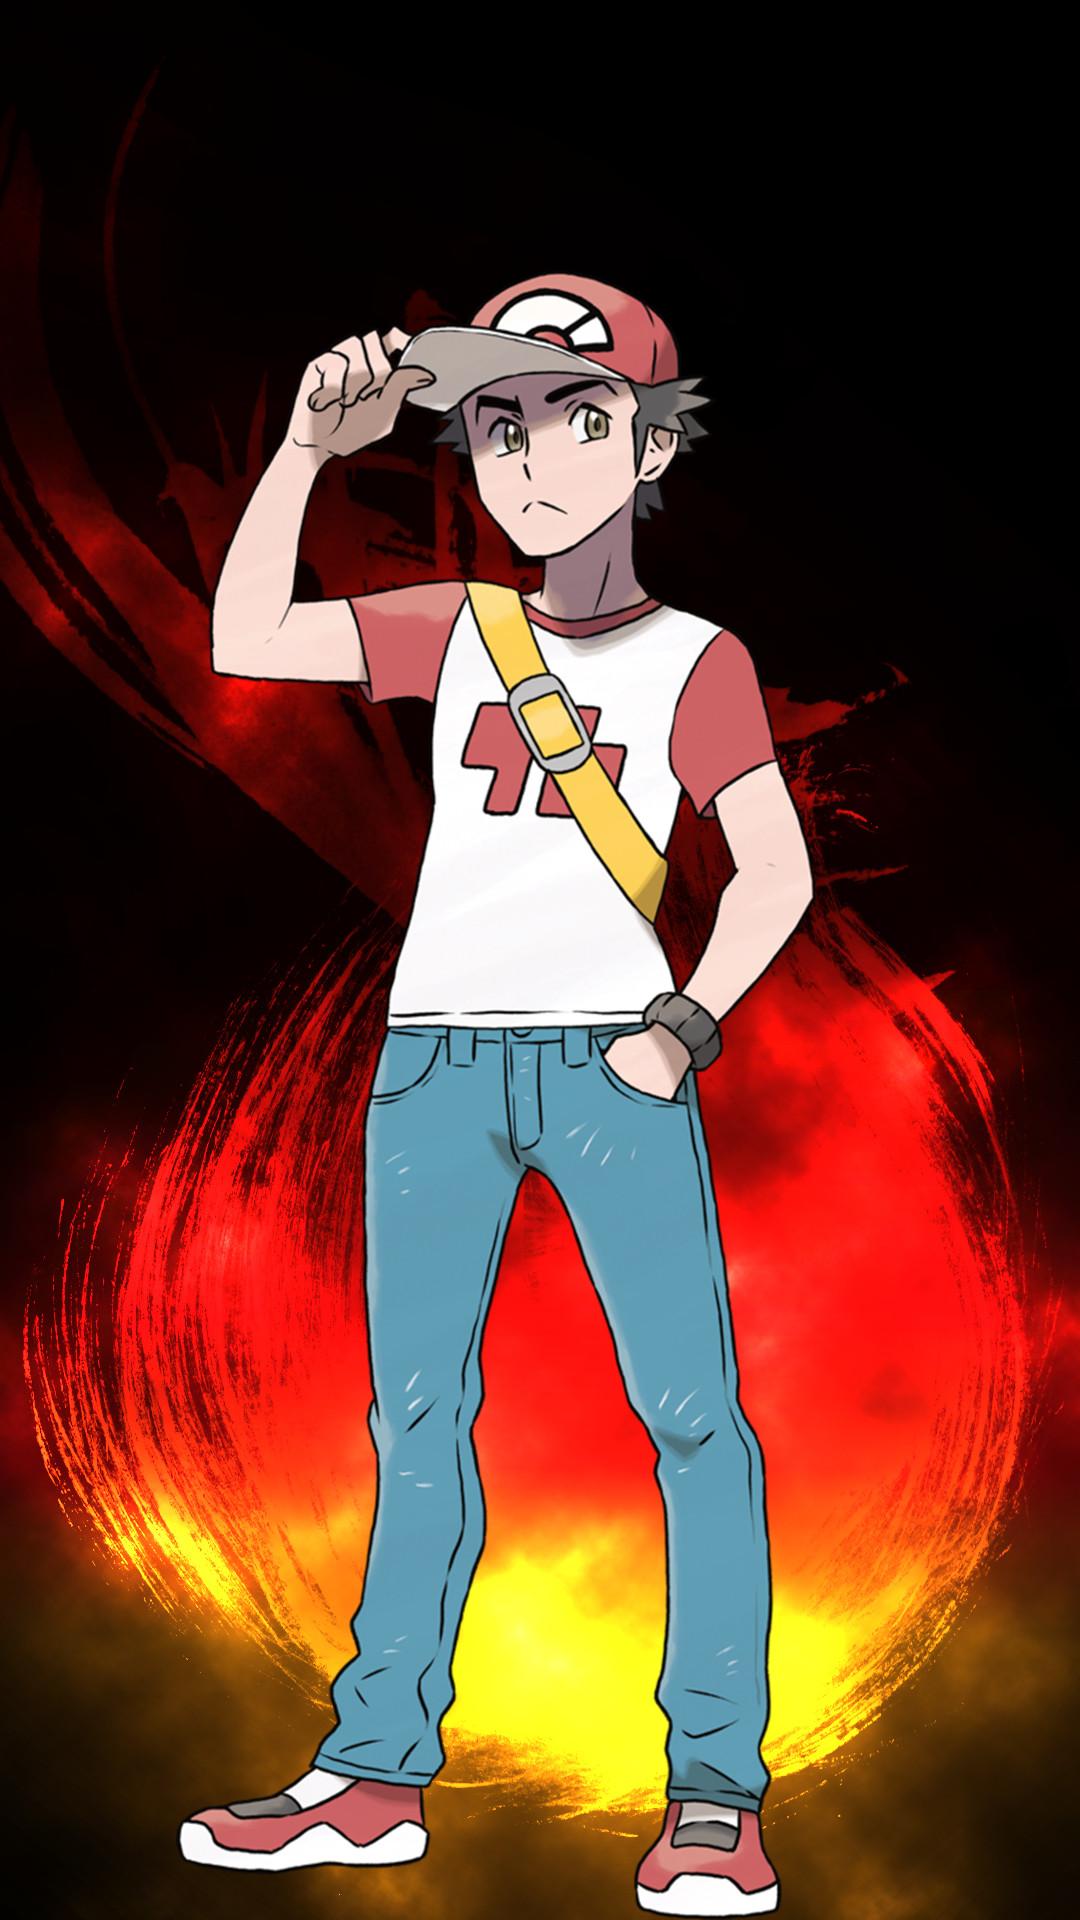 pokemon pokemon wallpaper pokemon wallpapers anime anime wallpaper anime  wallpapers trainer red trainer blue trainer green